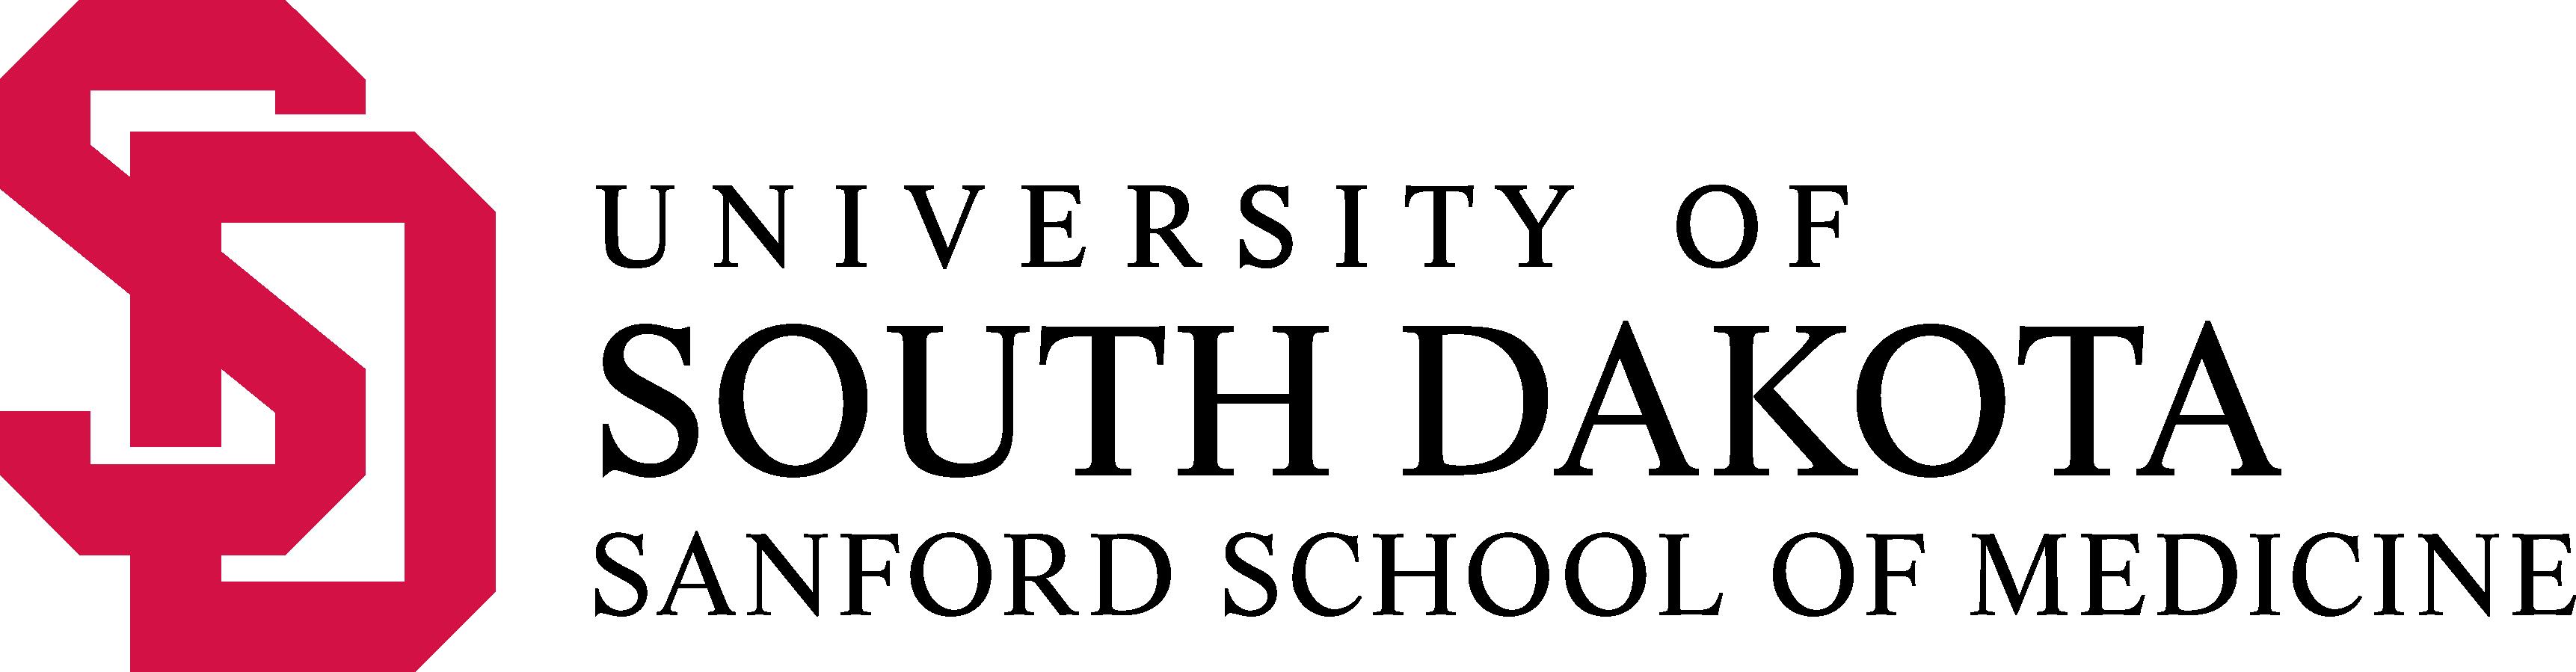 SSOM Horizontal Logo Print.png